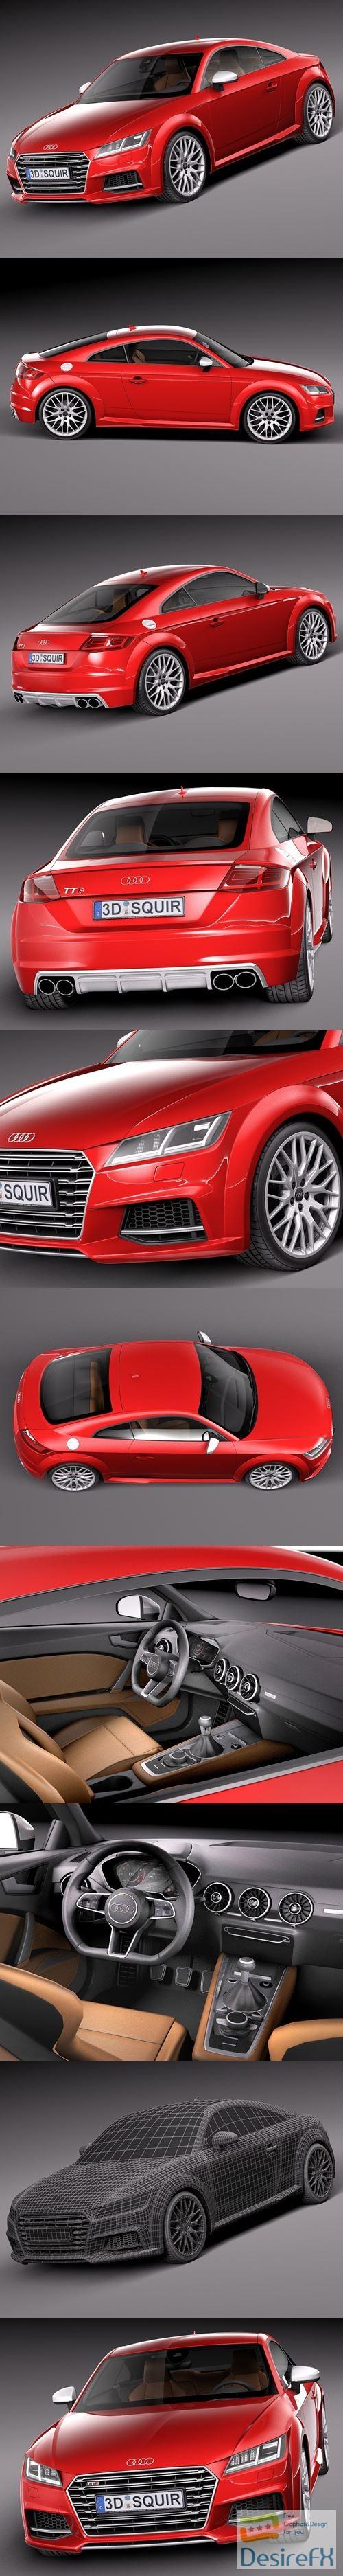 3d-models - Audi TTS Coupe 2015 3D Model